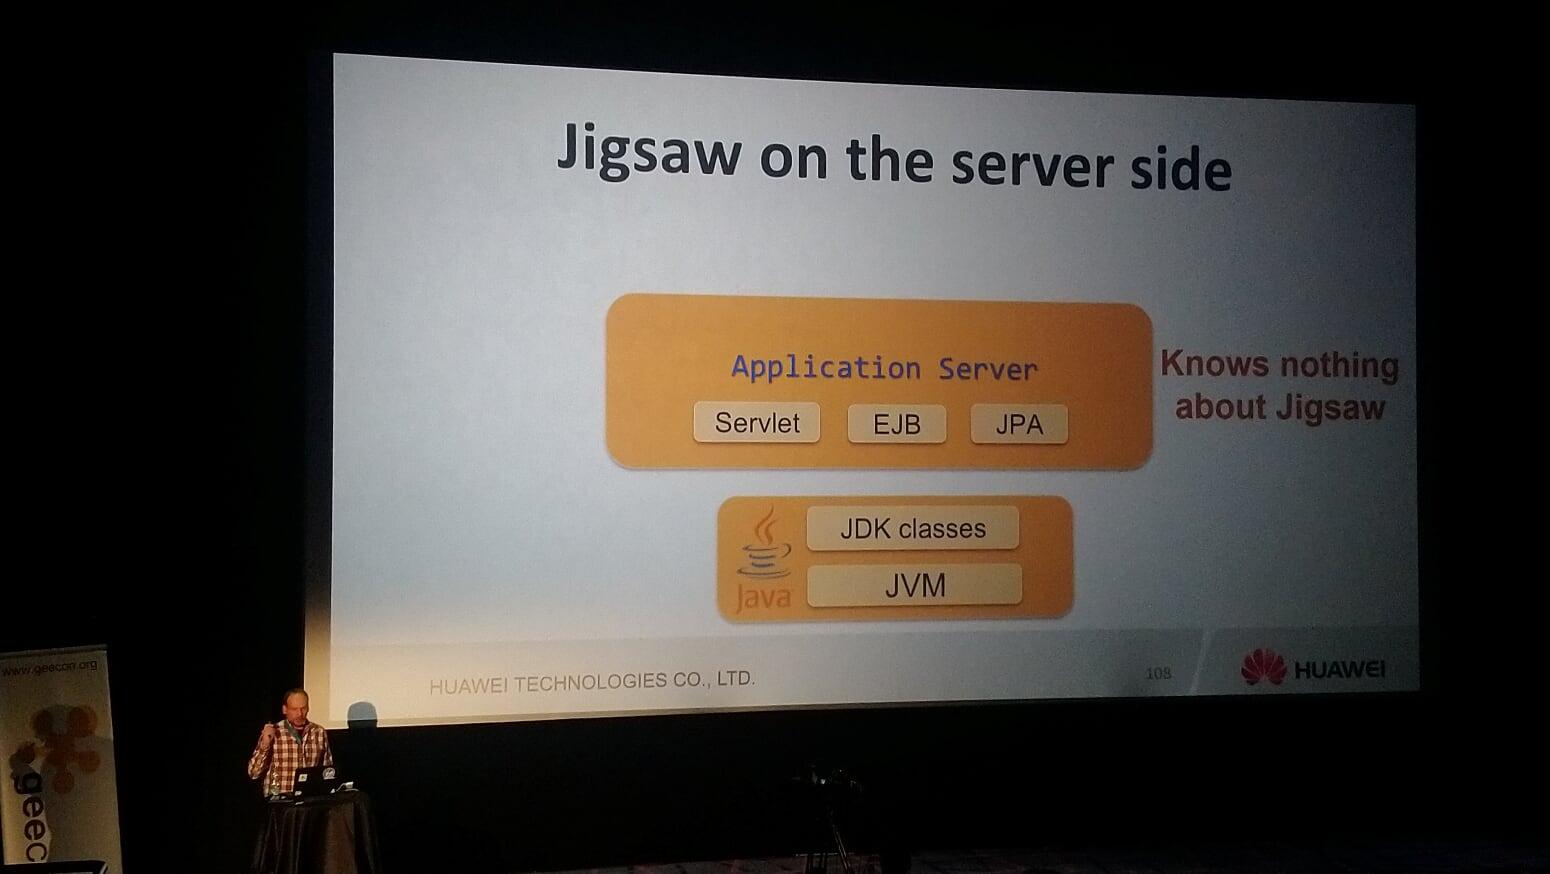 jigsaw-on-server-side